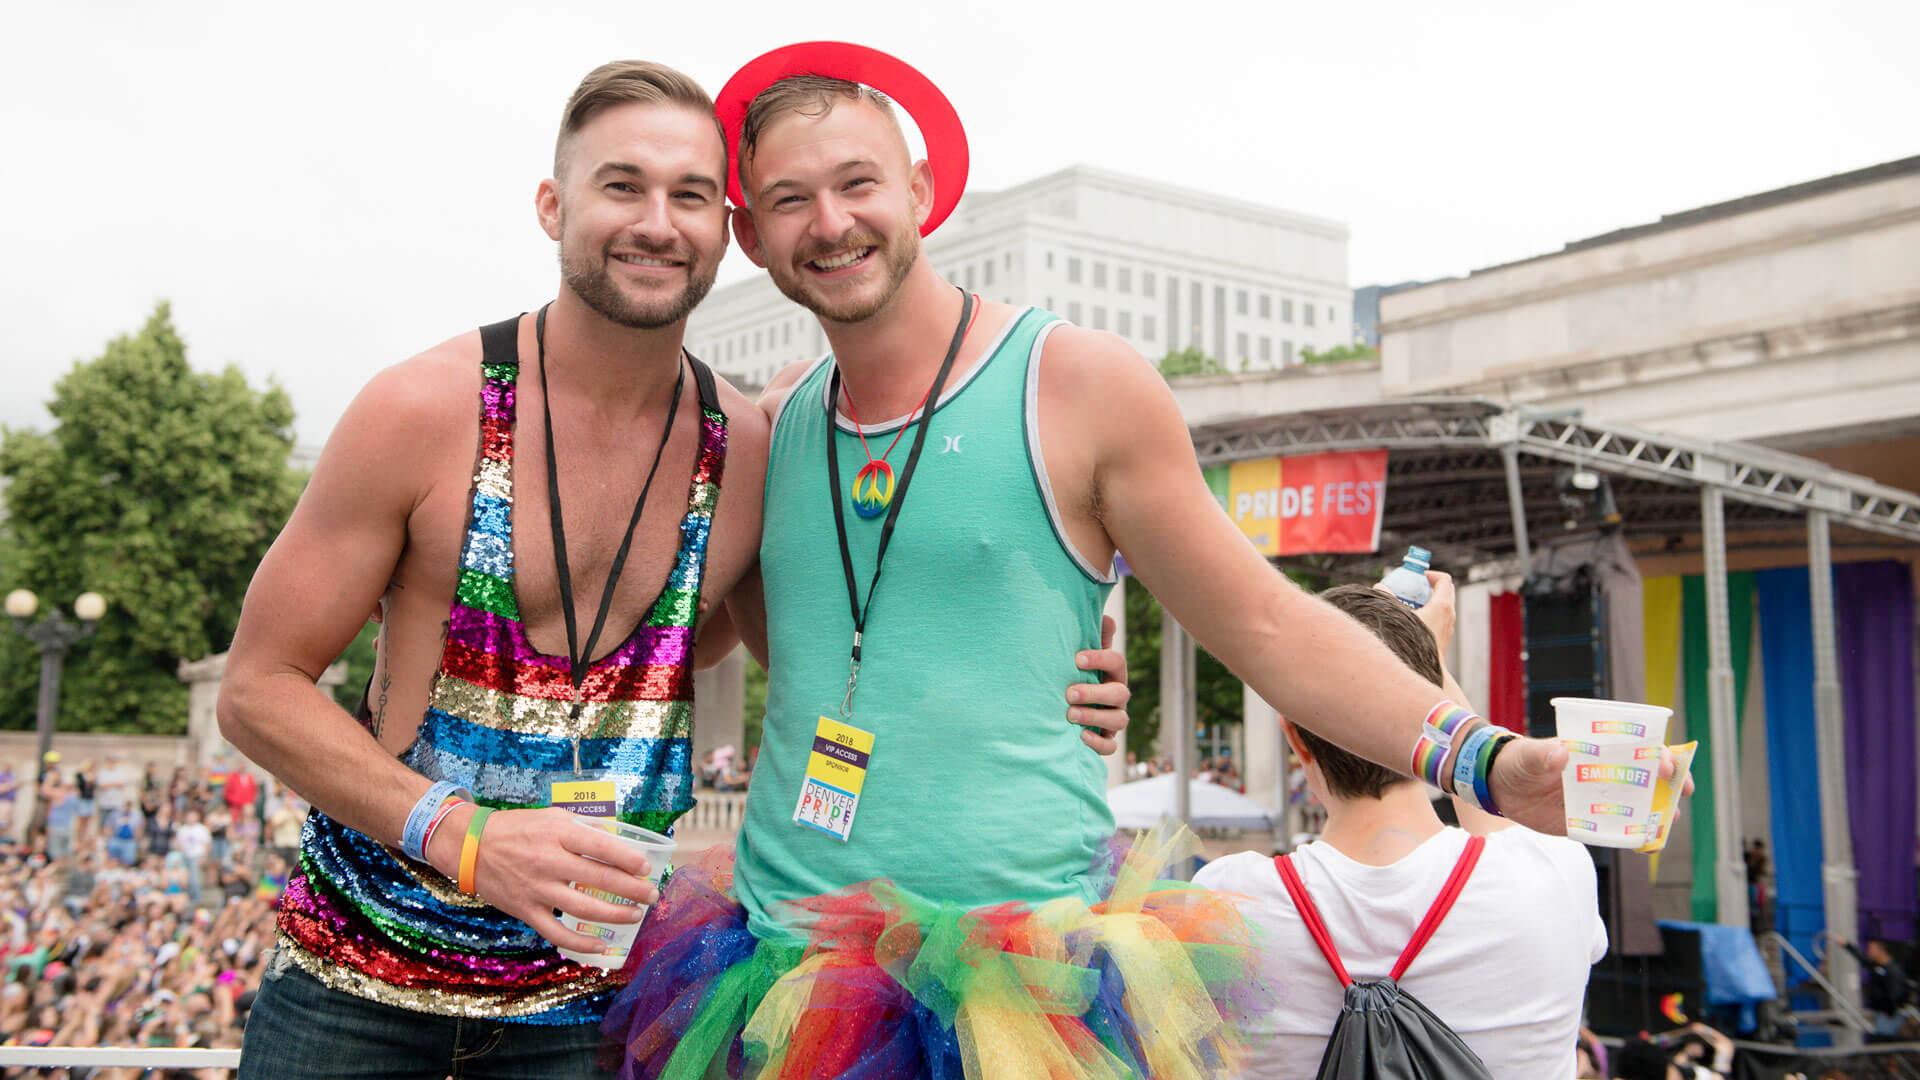 Denver PrideFest at Civic Center Park